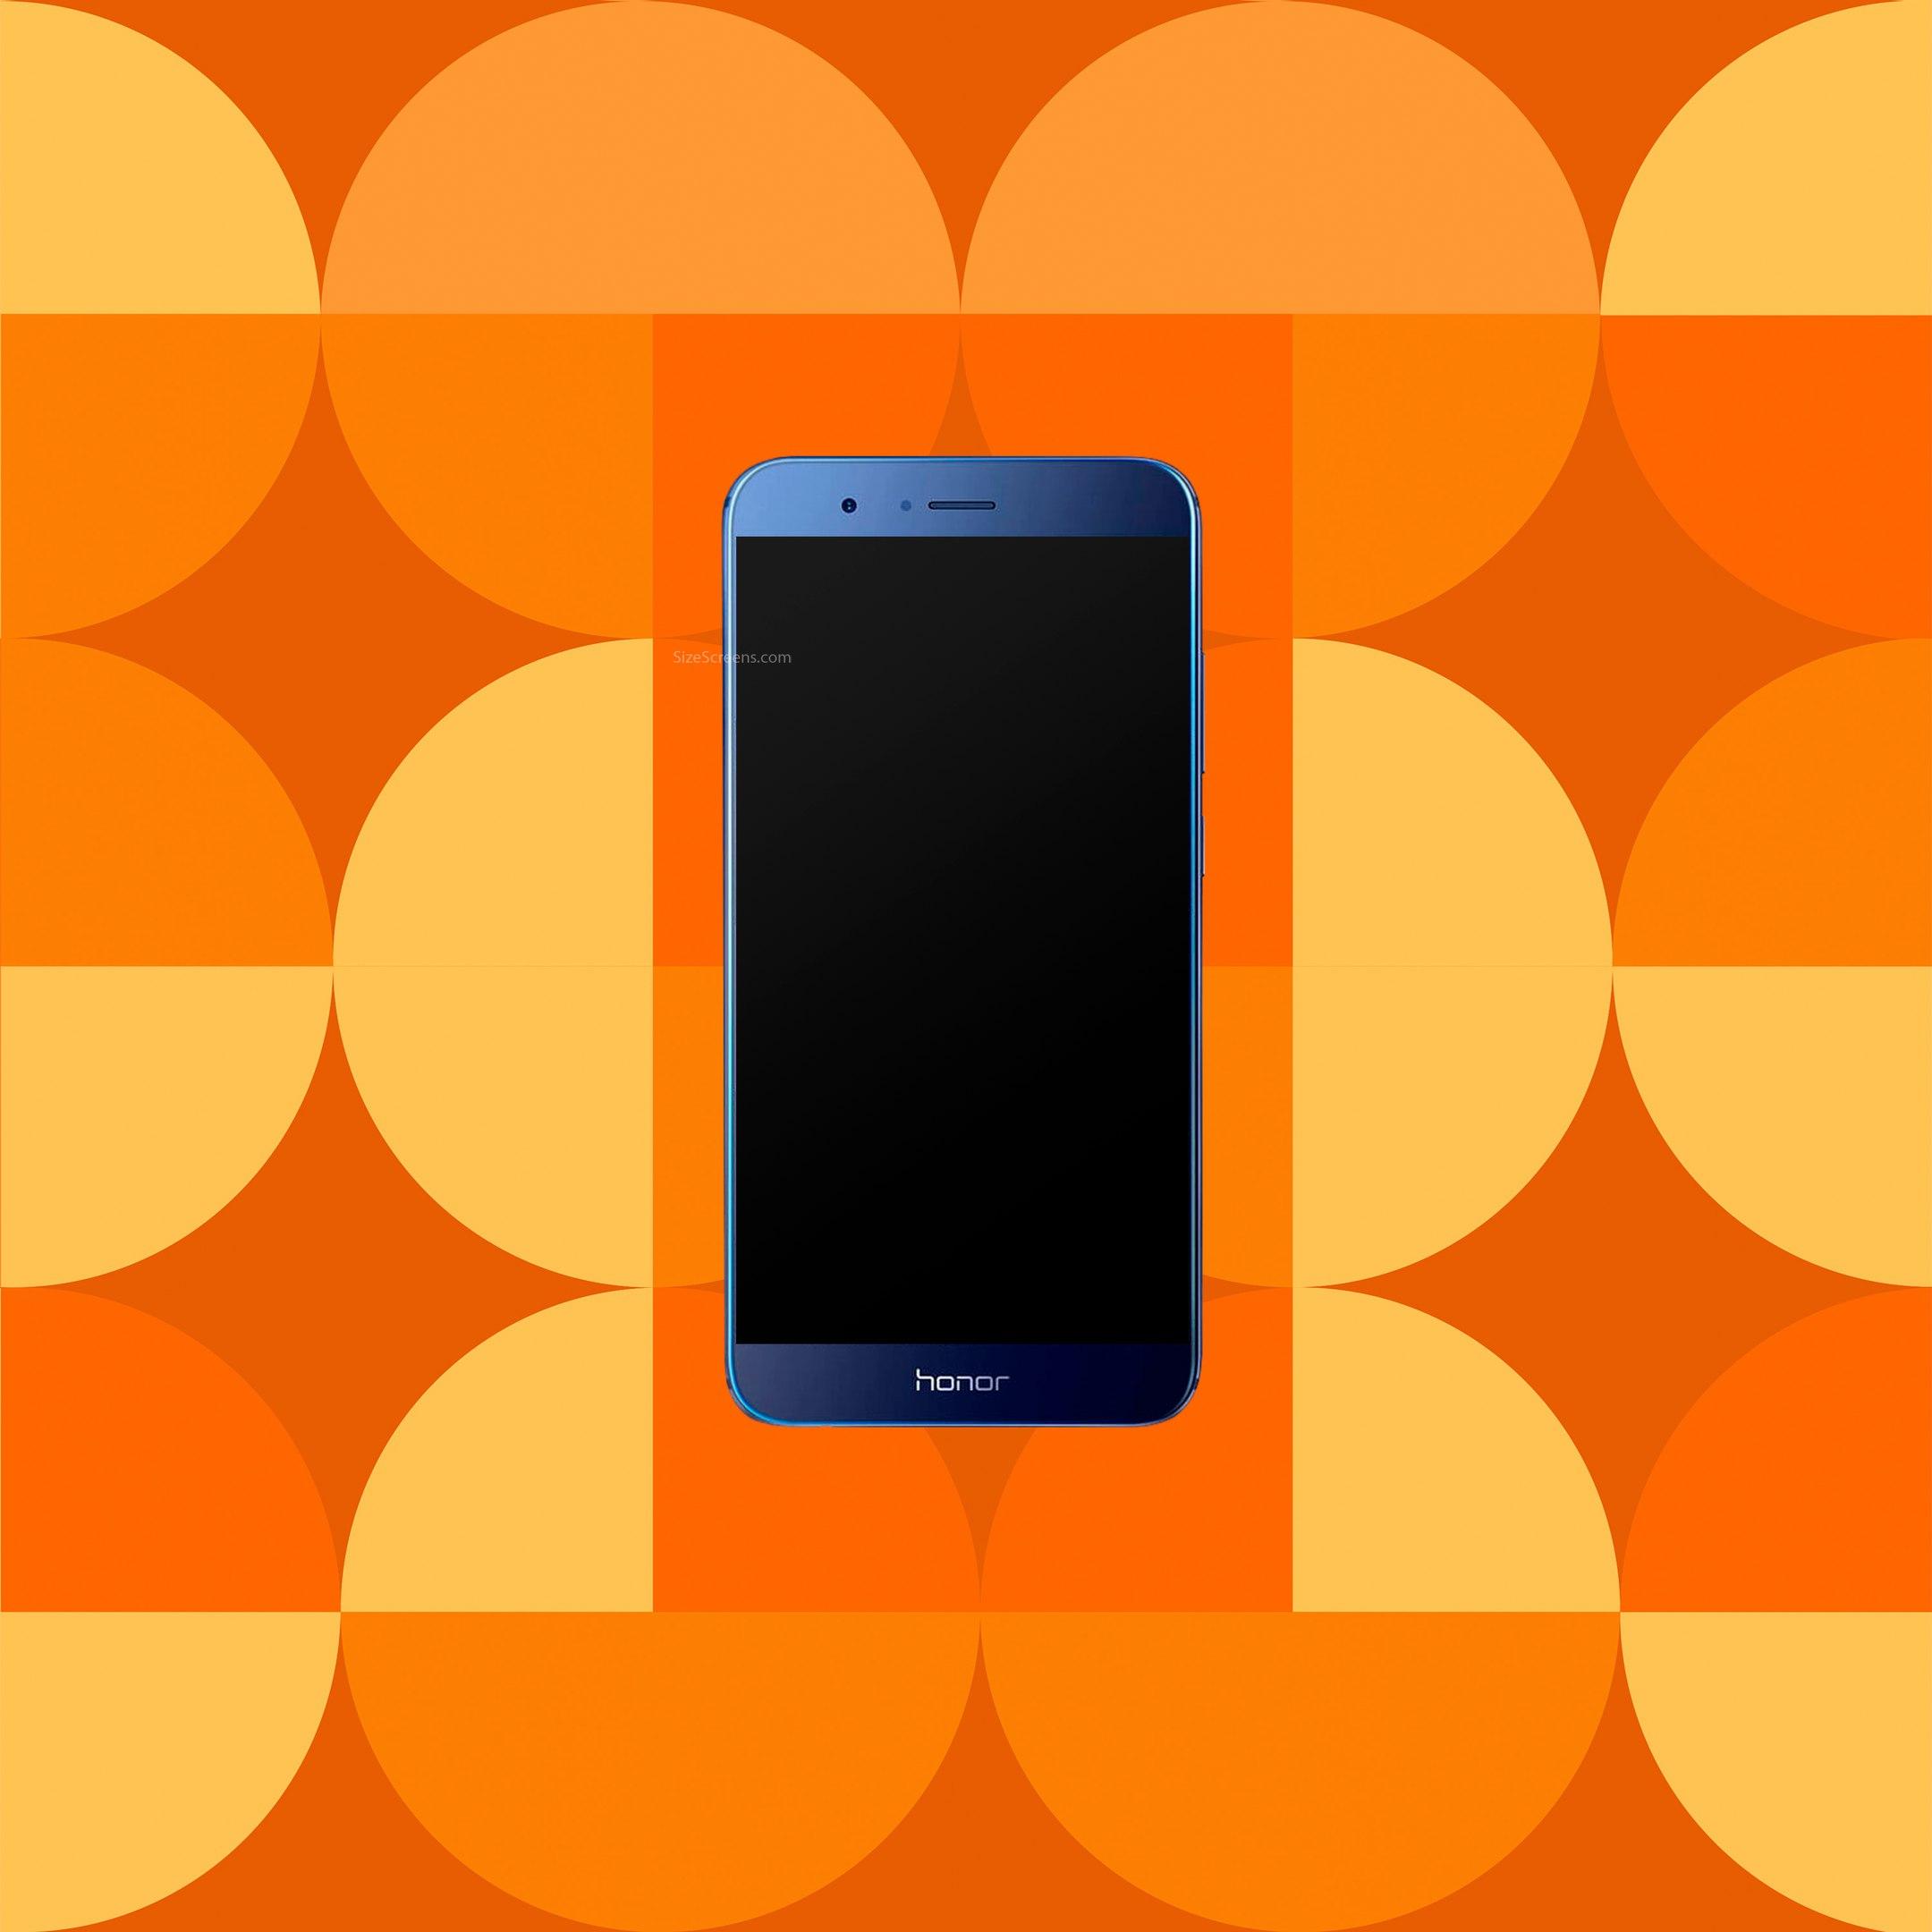 Huawei Honor 8 Pro Screen • SizeScreens Nokia Smart Phone Price